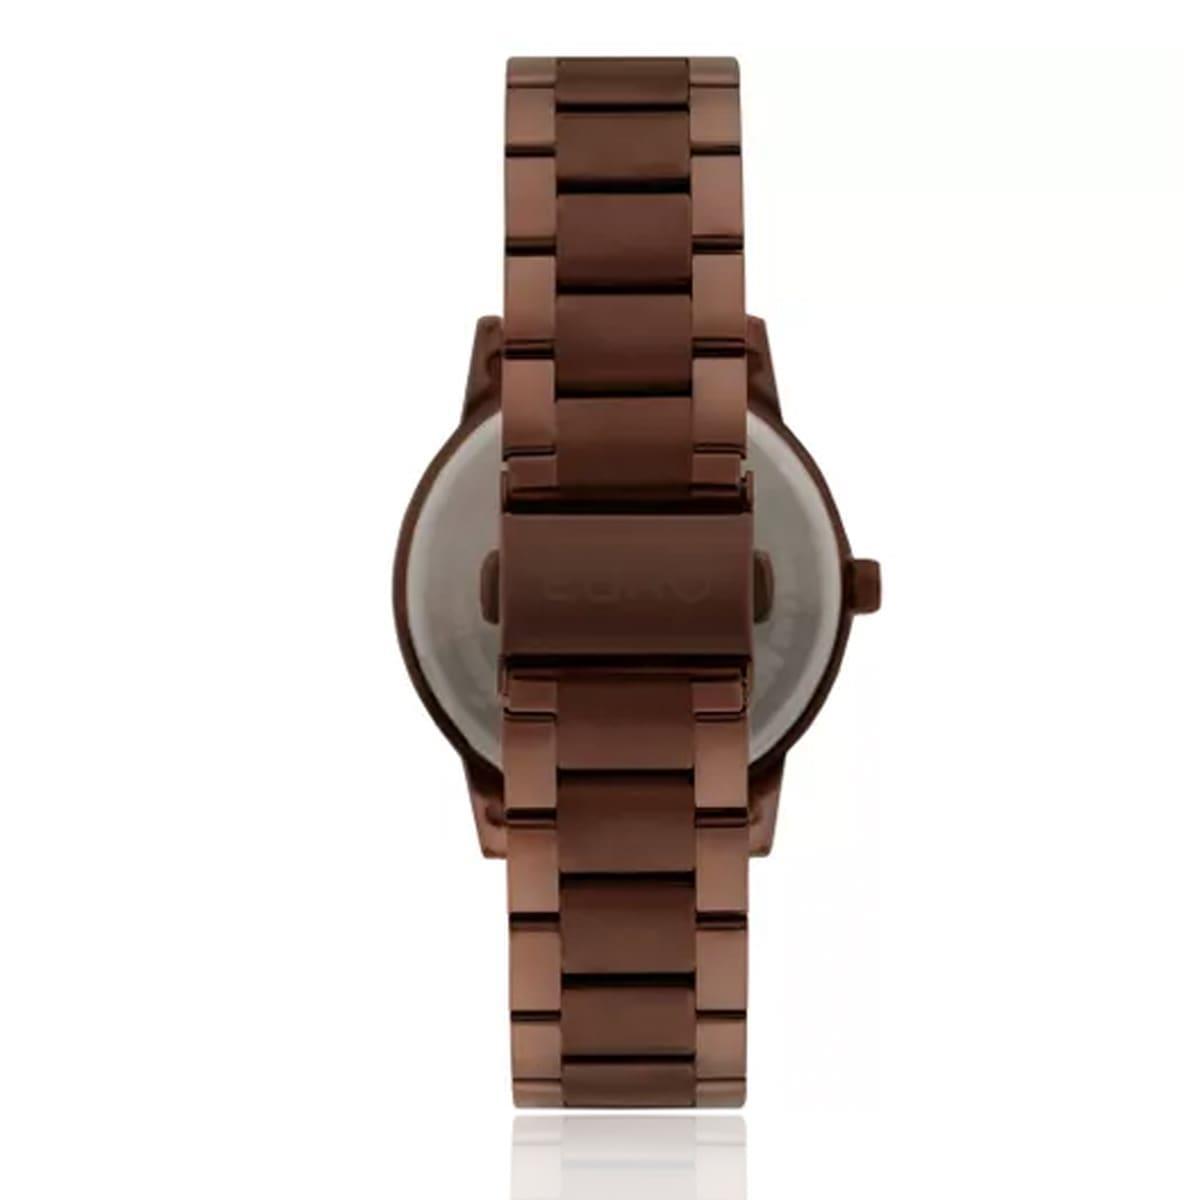 f90339956c6 Relógio Feminino Euro Metal Colors Analógico EU2036YLJ 4M Marrom